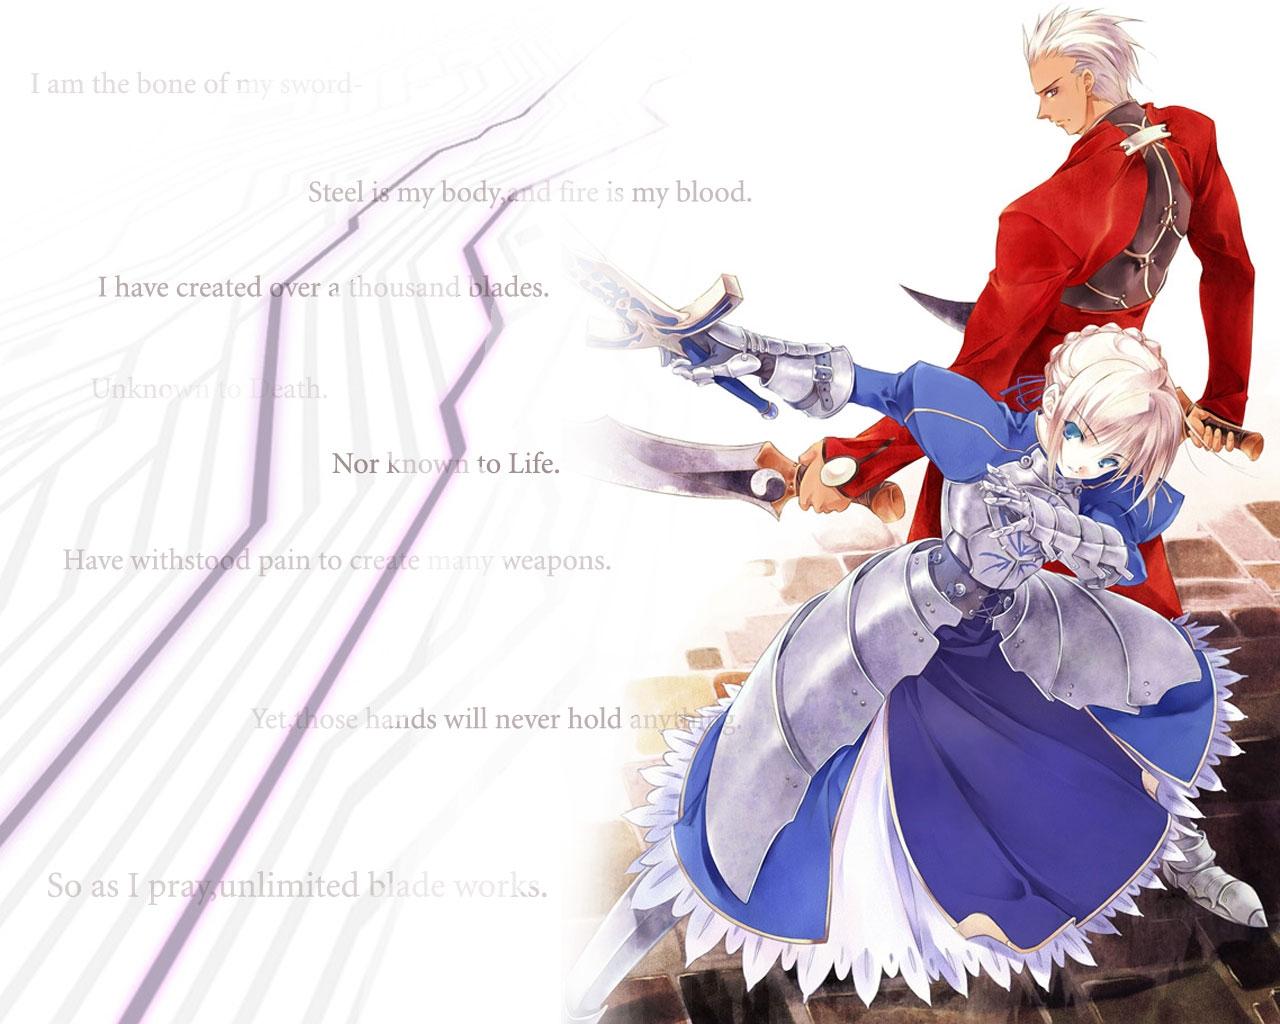 Anime   FateStay Night Unlimited Blade Works Saber Archer Wallpaper 1280x1024